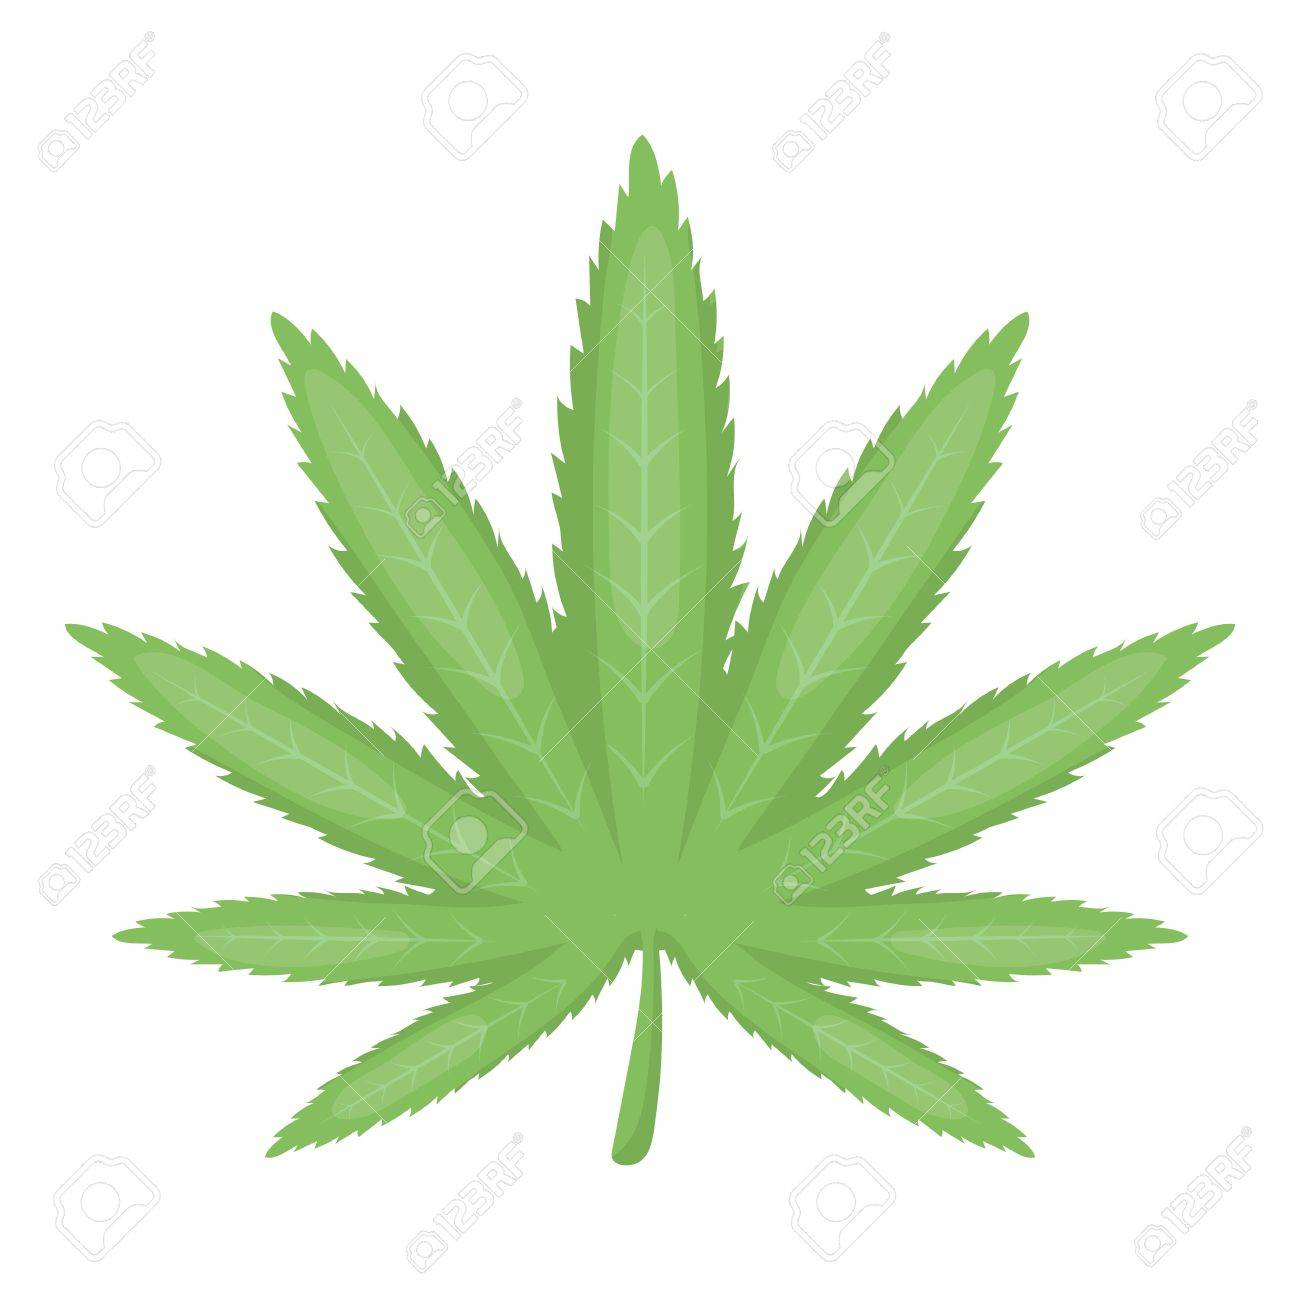 marijuana leaf icon in cartoon style isolated on white background rh 123rf com Simple Outline of Pot Leaf cartoon pot leaf tattoos